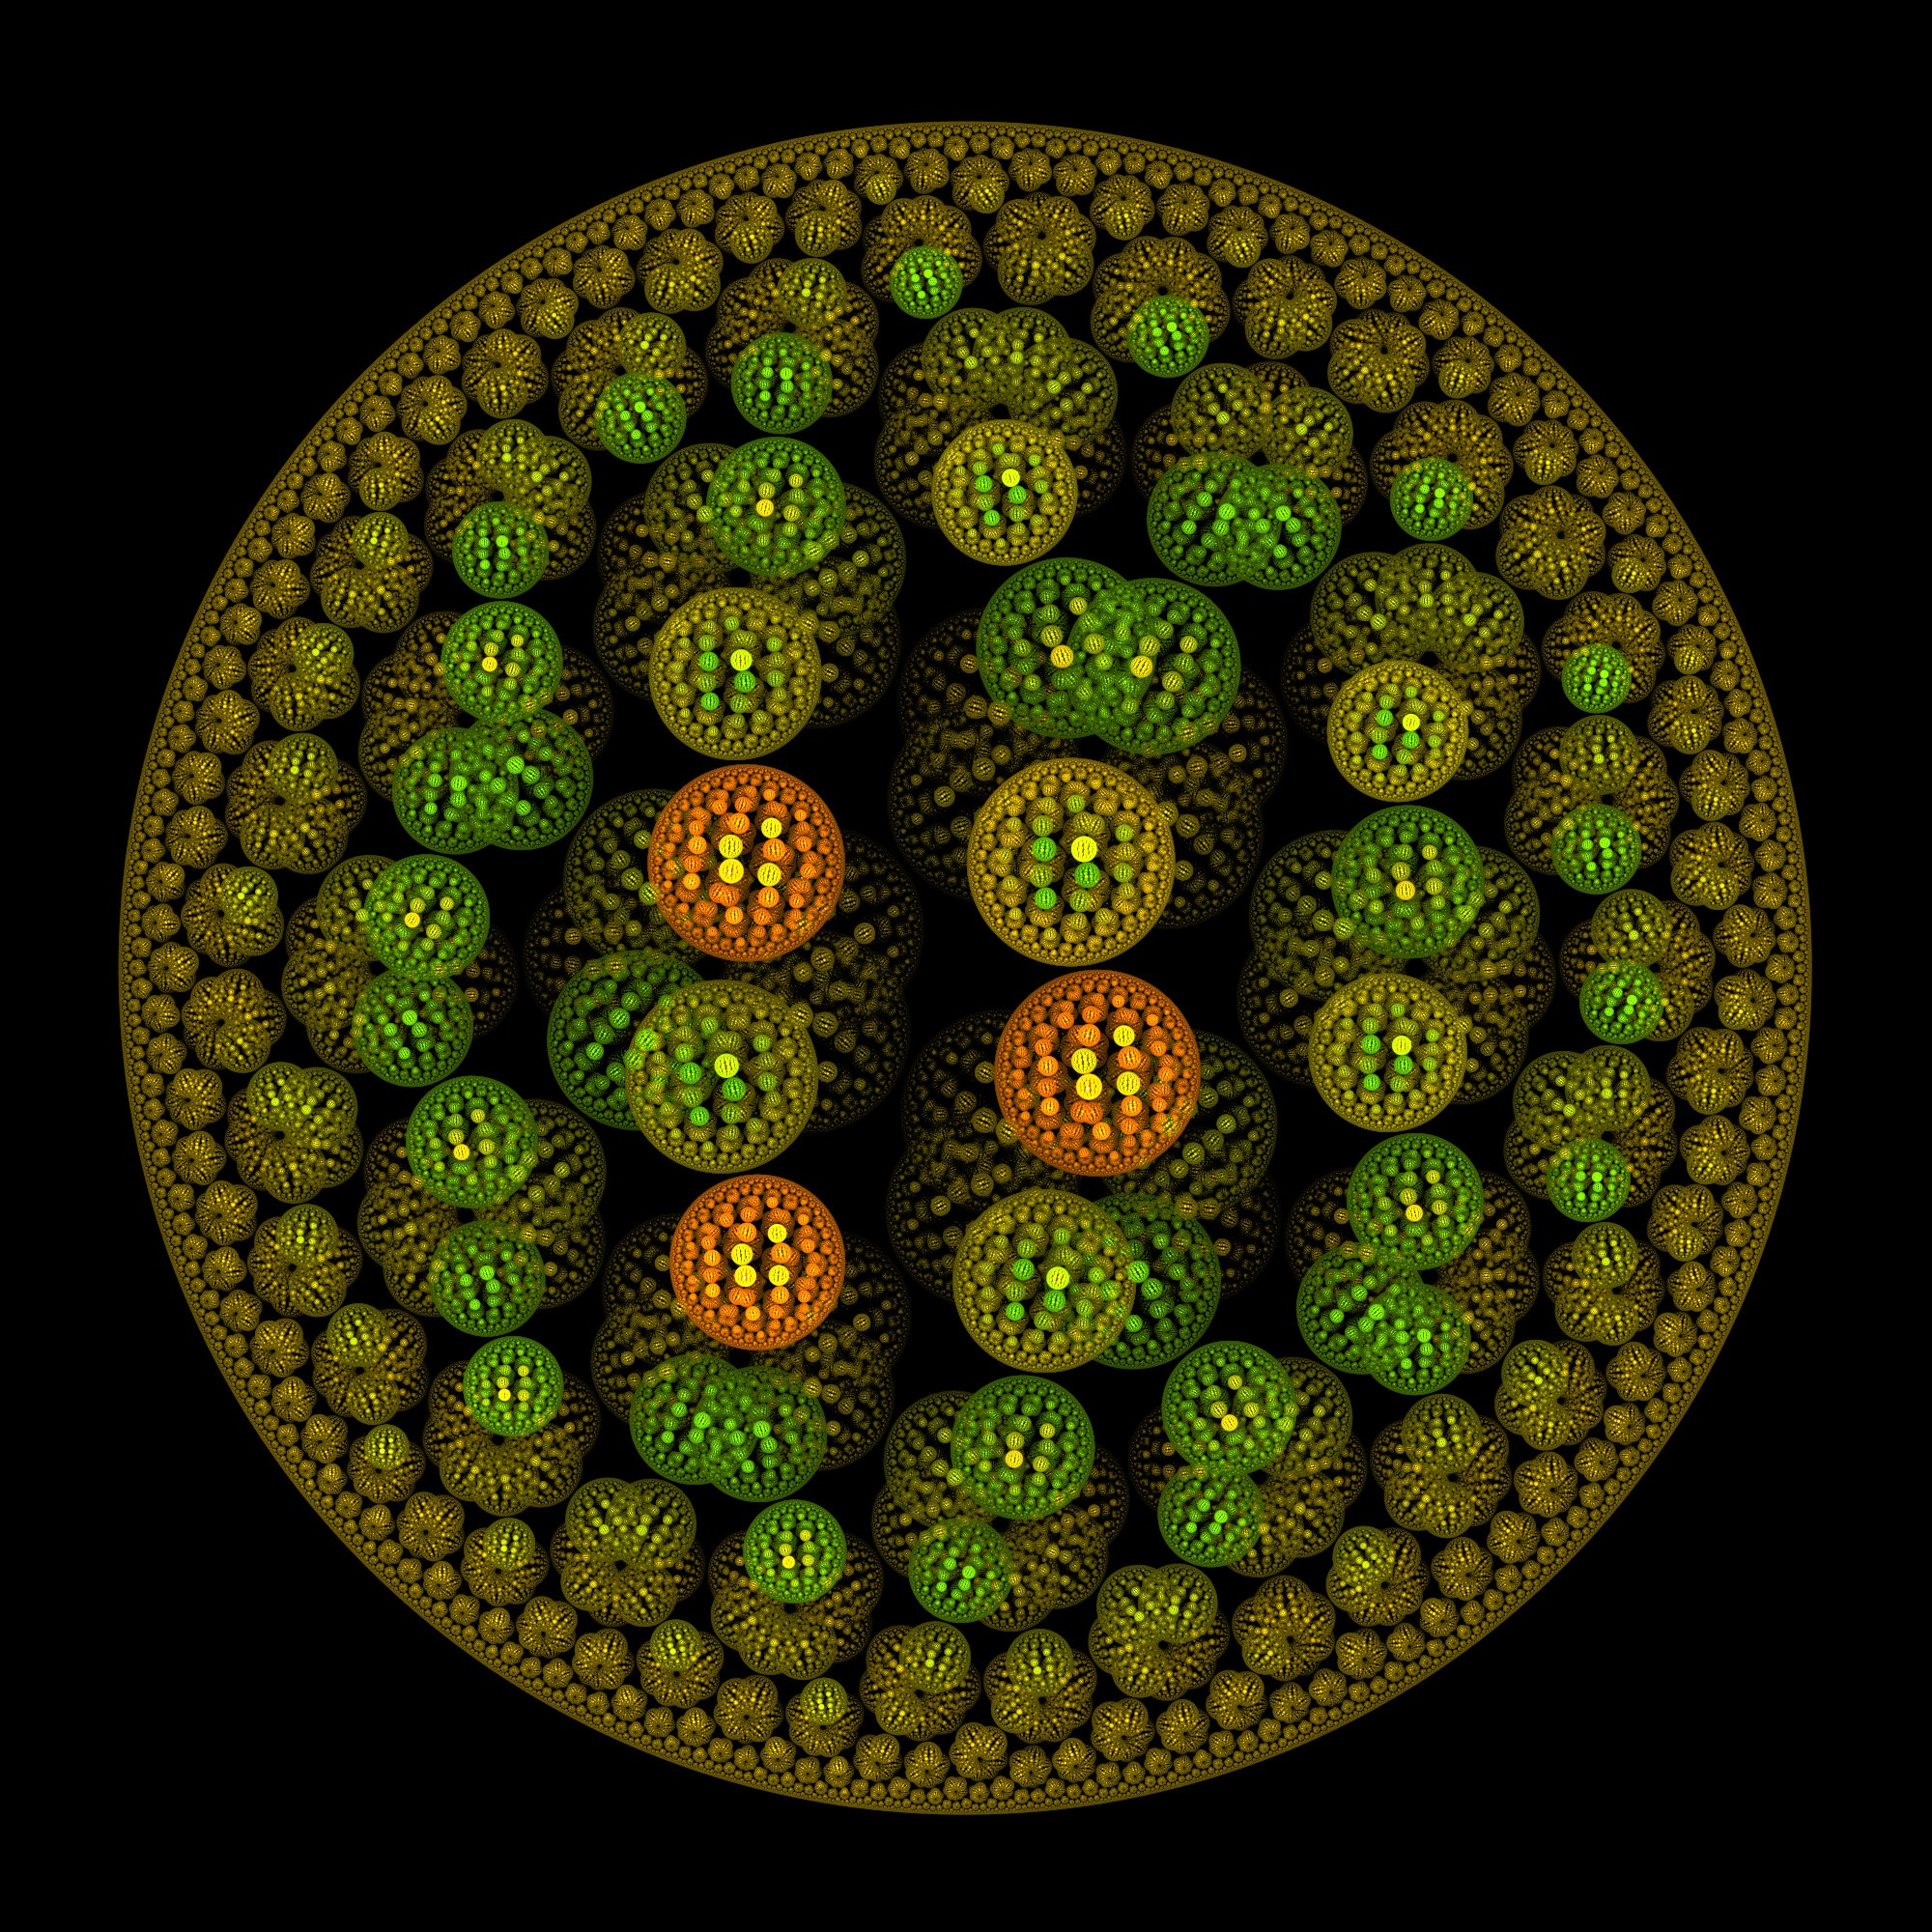 Mold Spheres